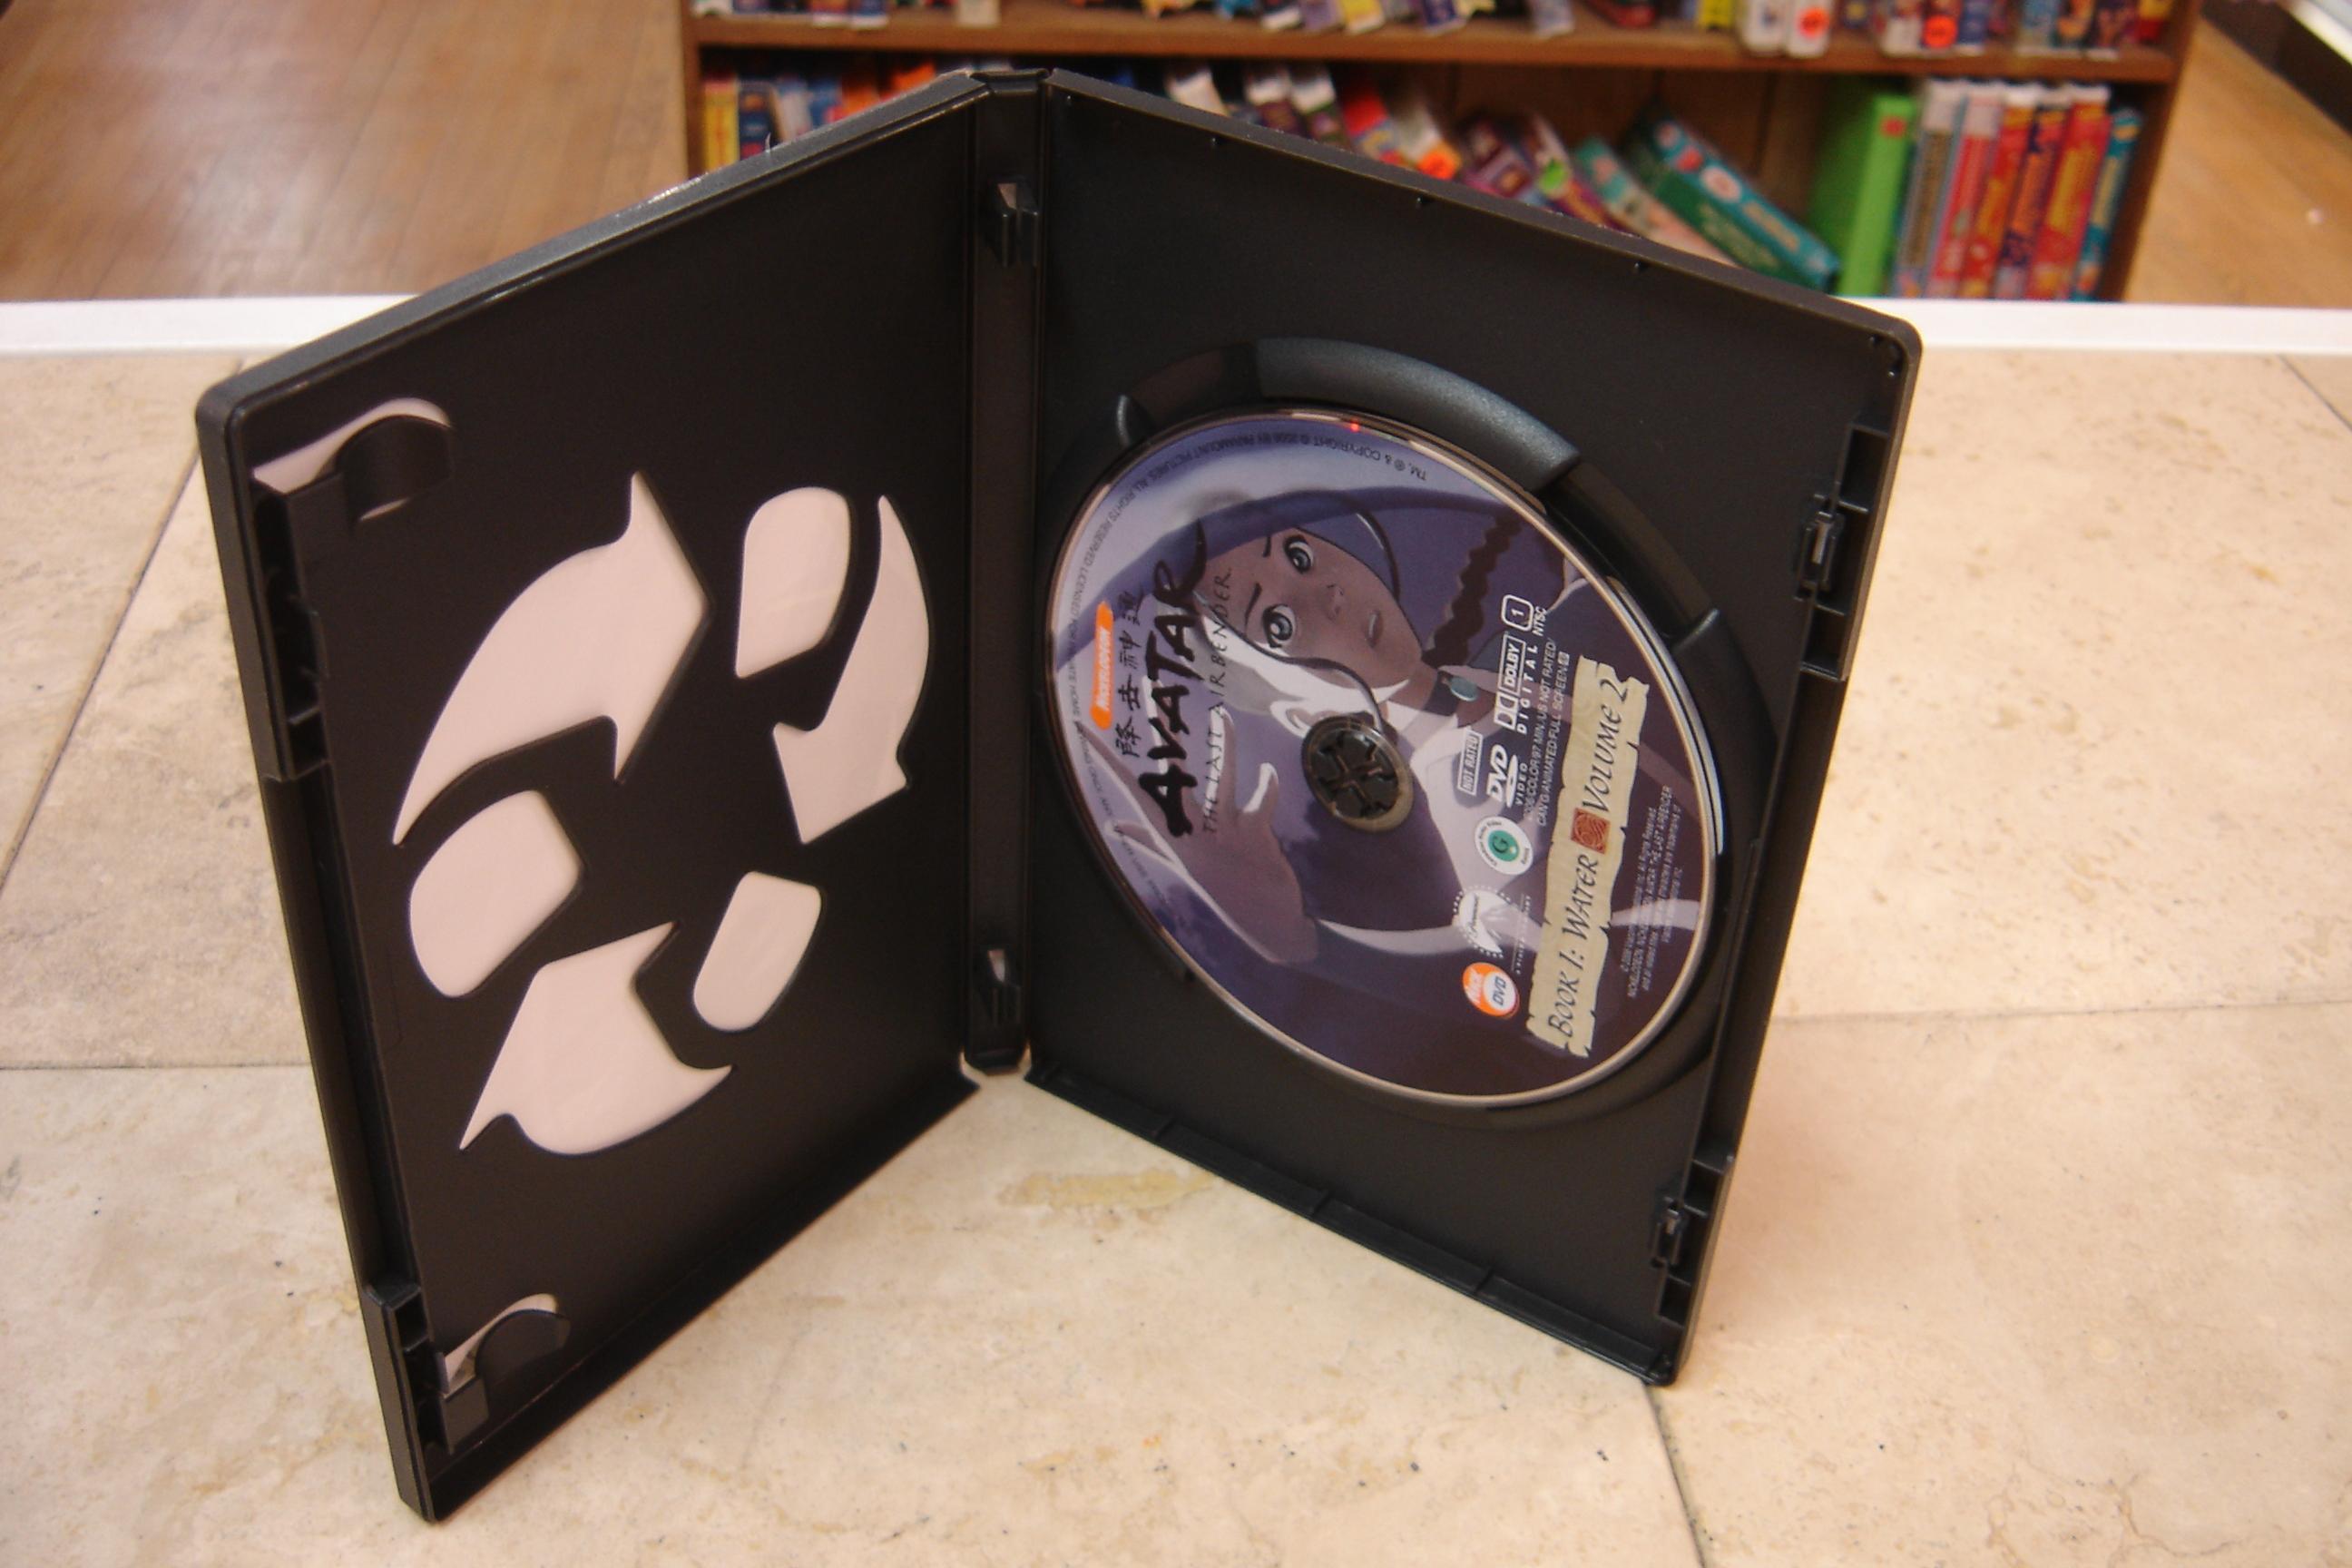 Pics photos description from nick jr favorites vol 2 dvd wallpaper -  Nickelodeon Avatar The Last Airbender Dvd Book 1